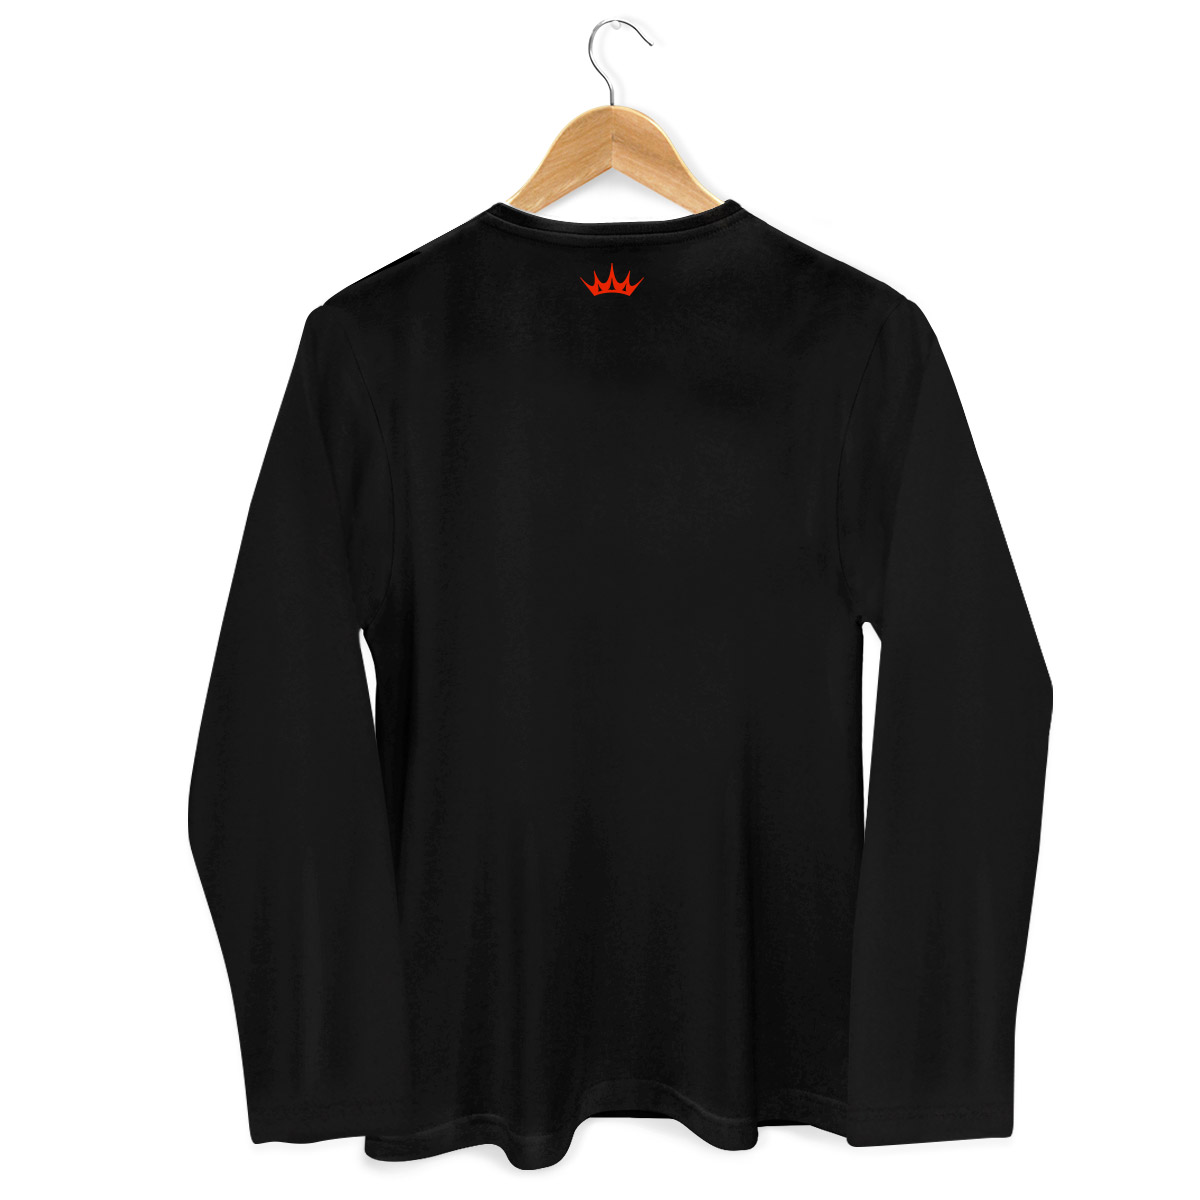 Camiseta Feminina de Manga Longa Ivete Sangalo Piscadela Black